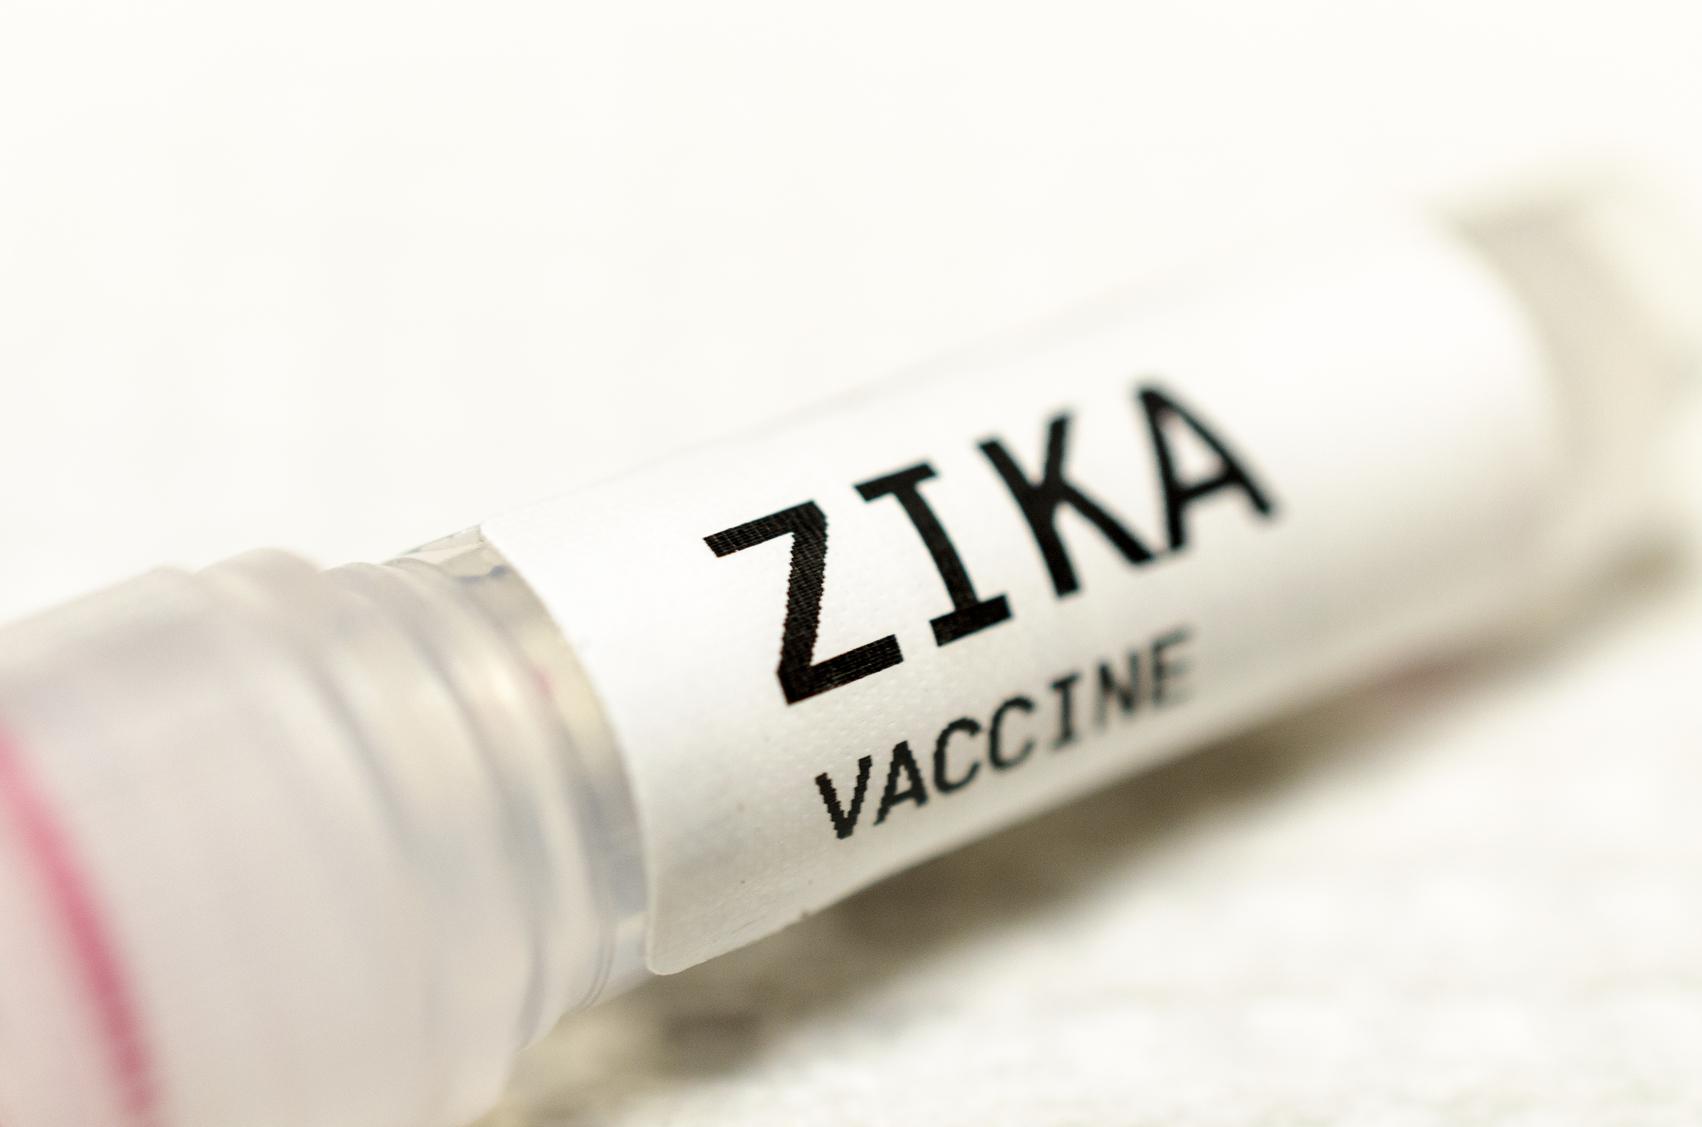 Vaccino Zika, primo test su umani